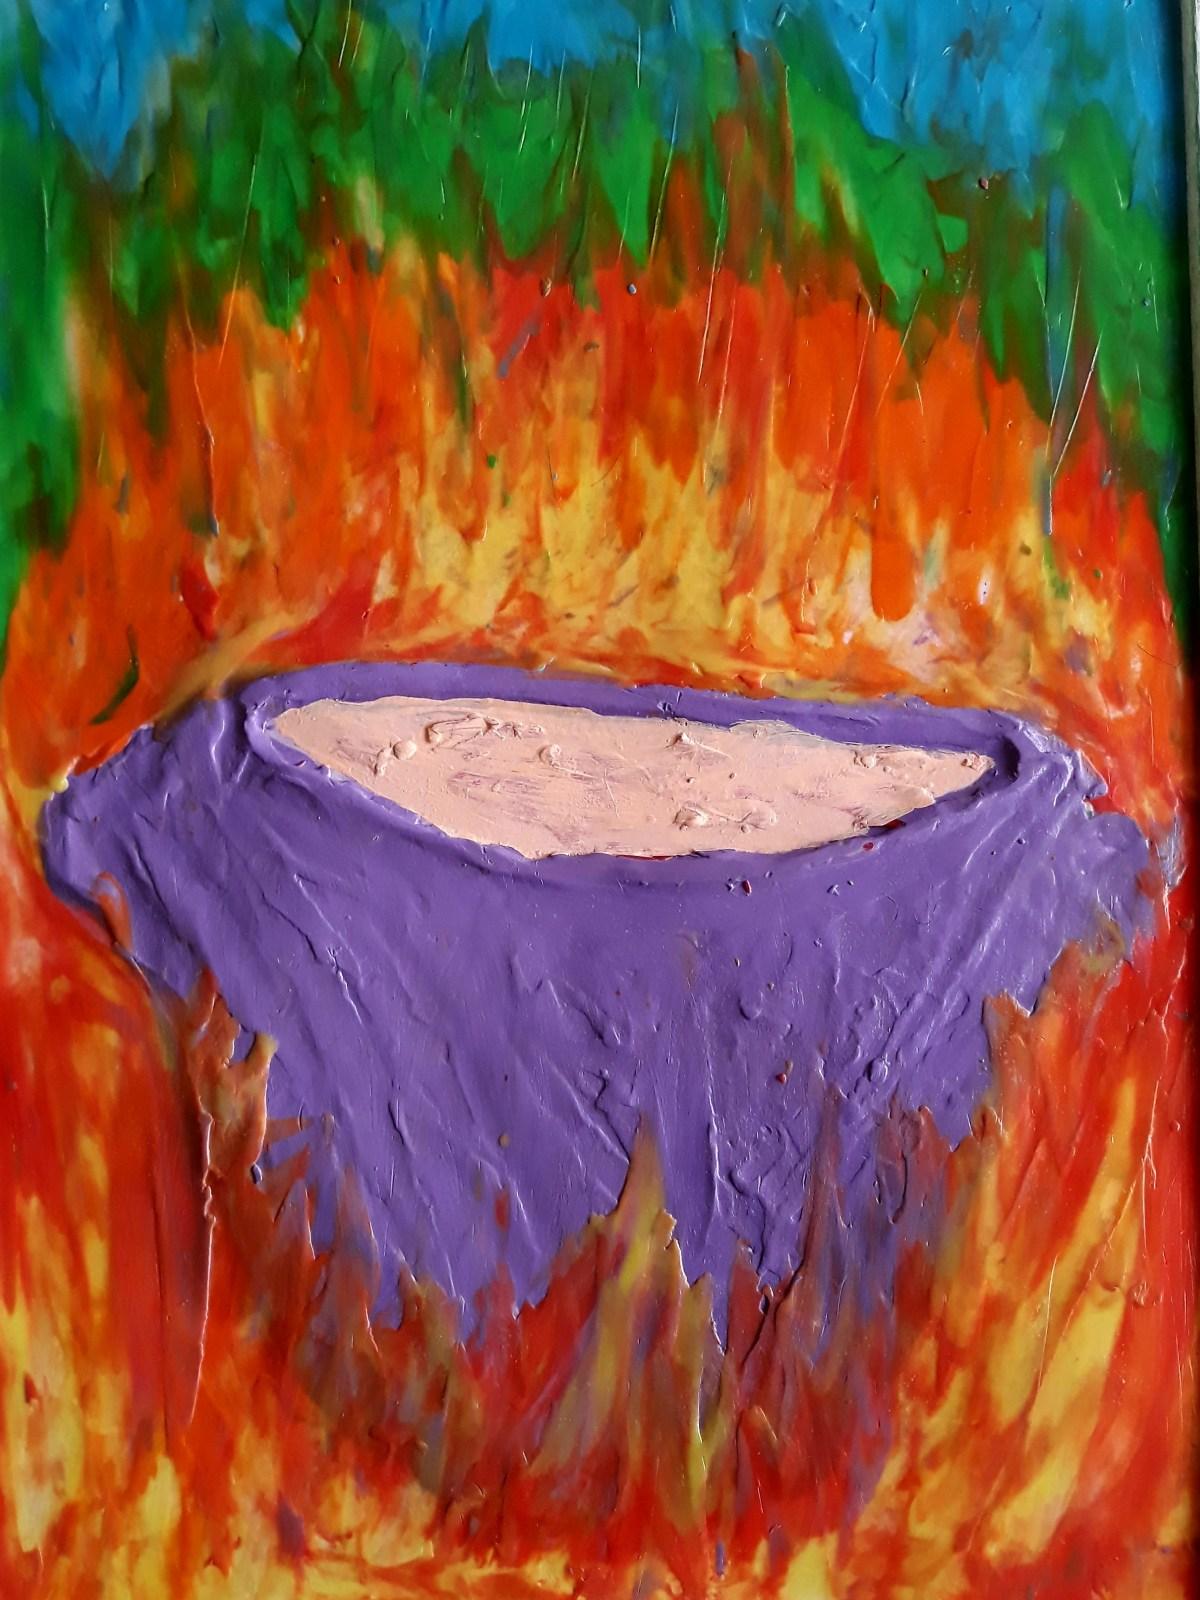 El caldero violeta